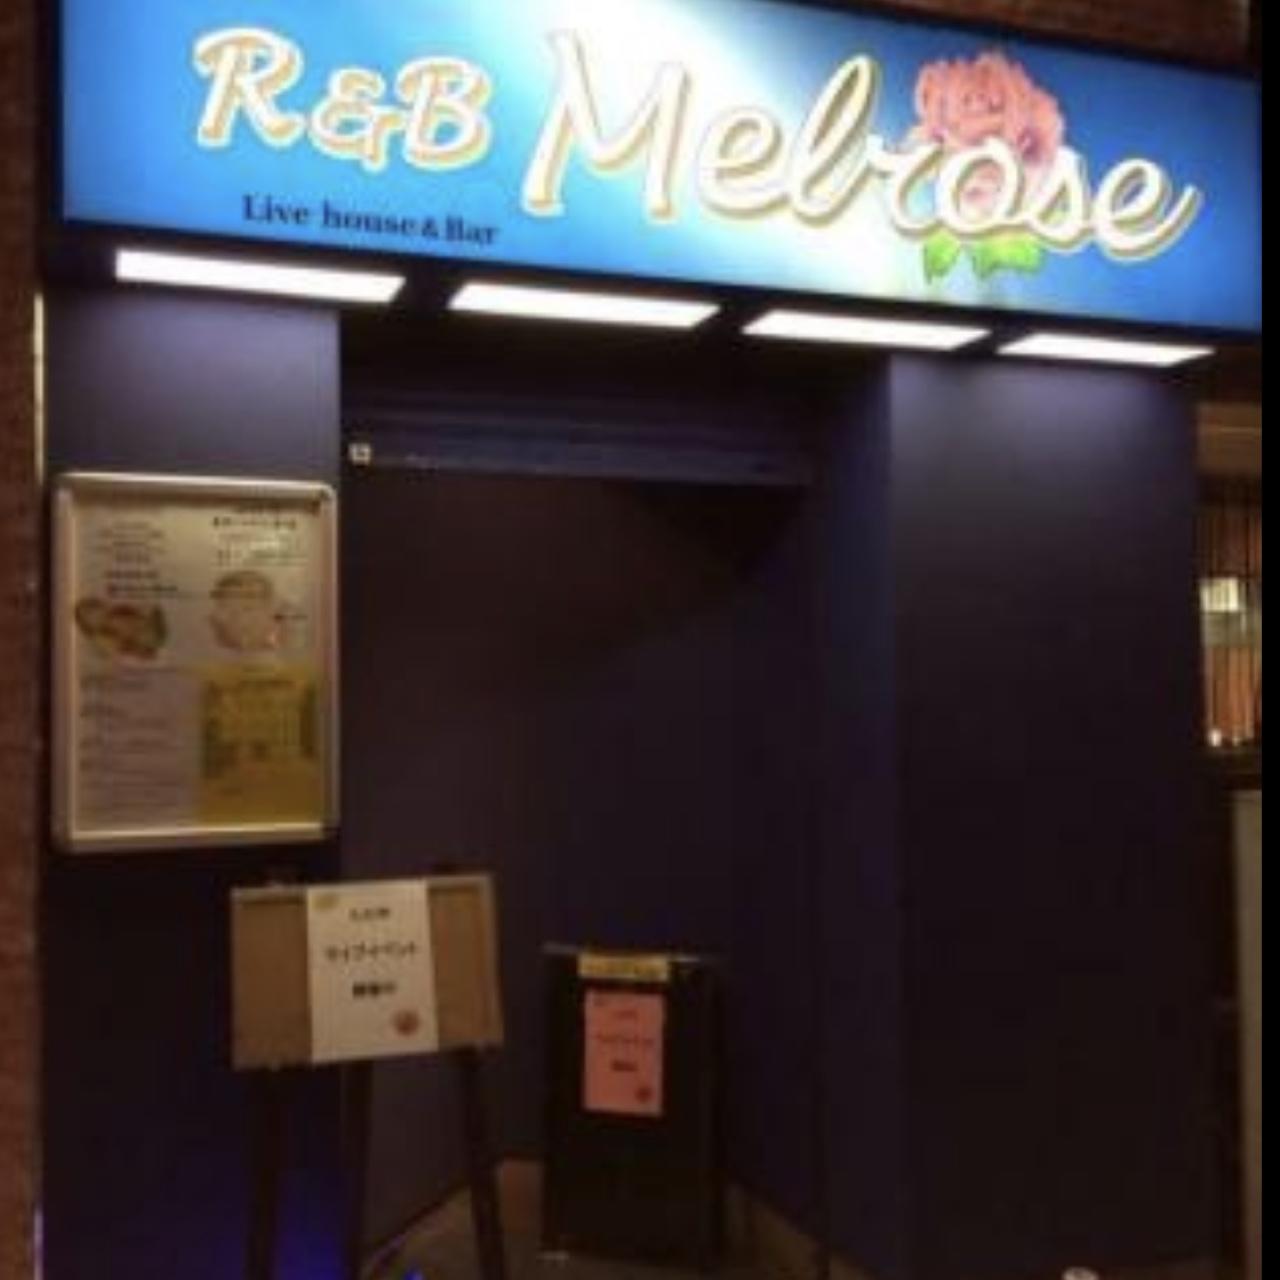 R&B Melrose メルローズ>